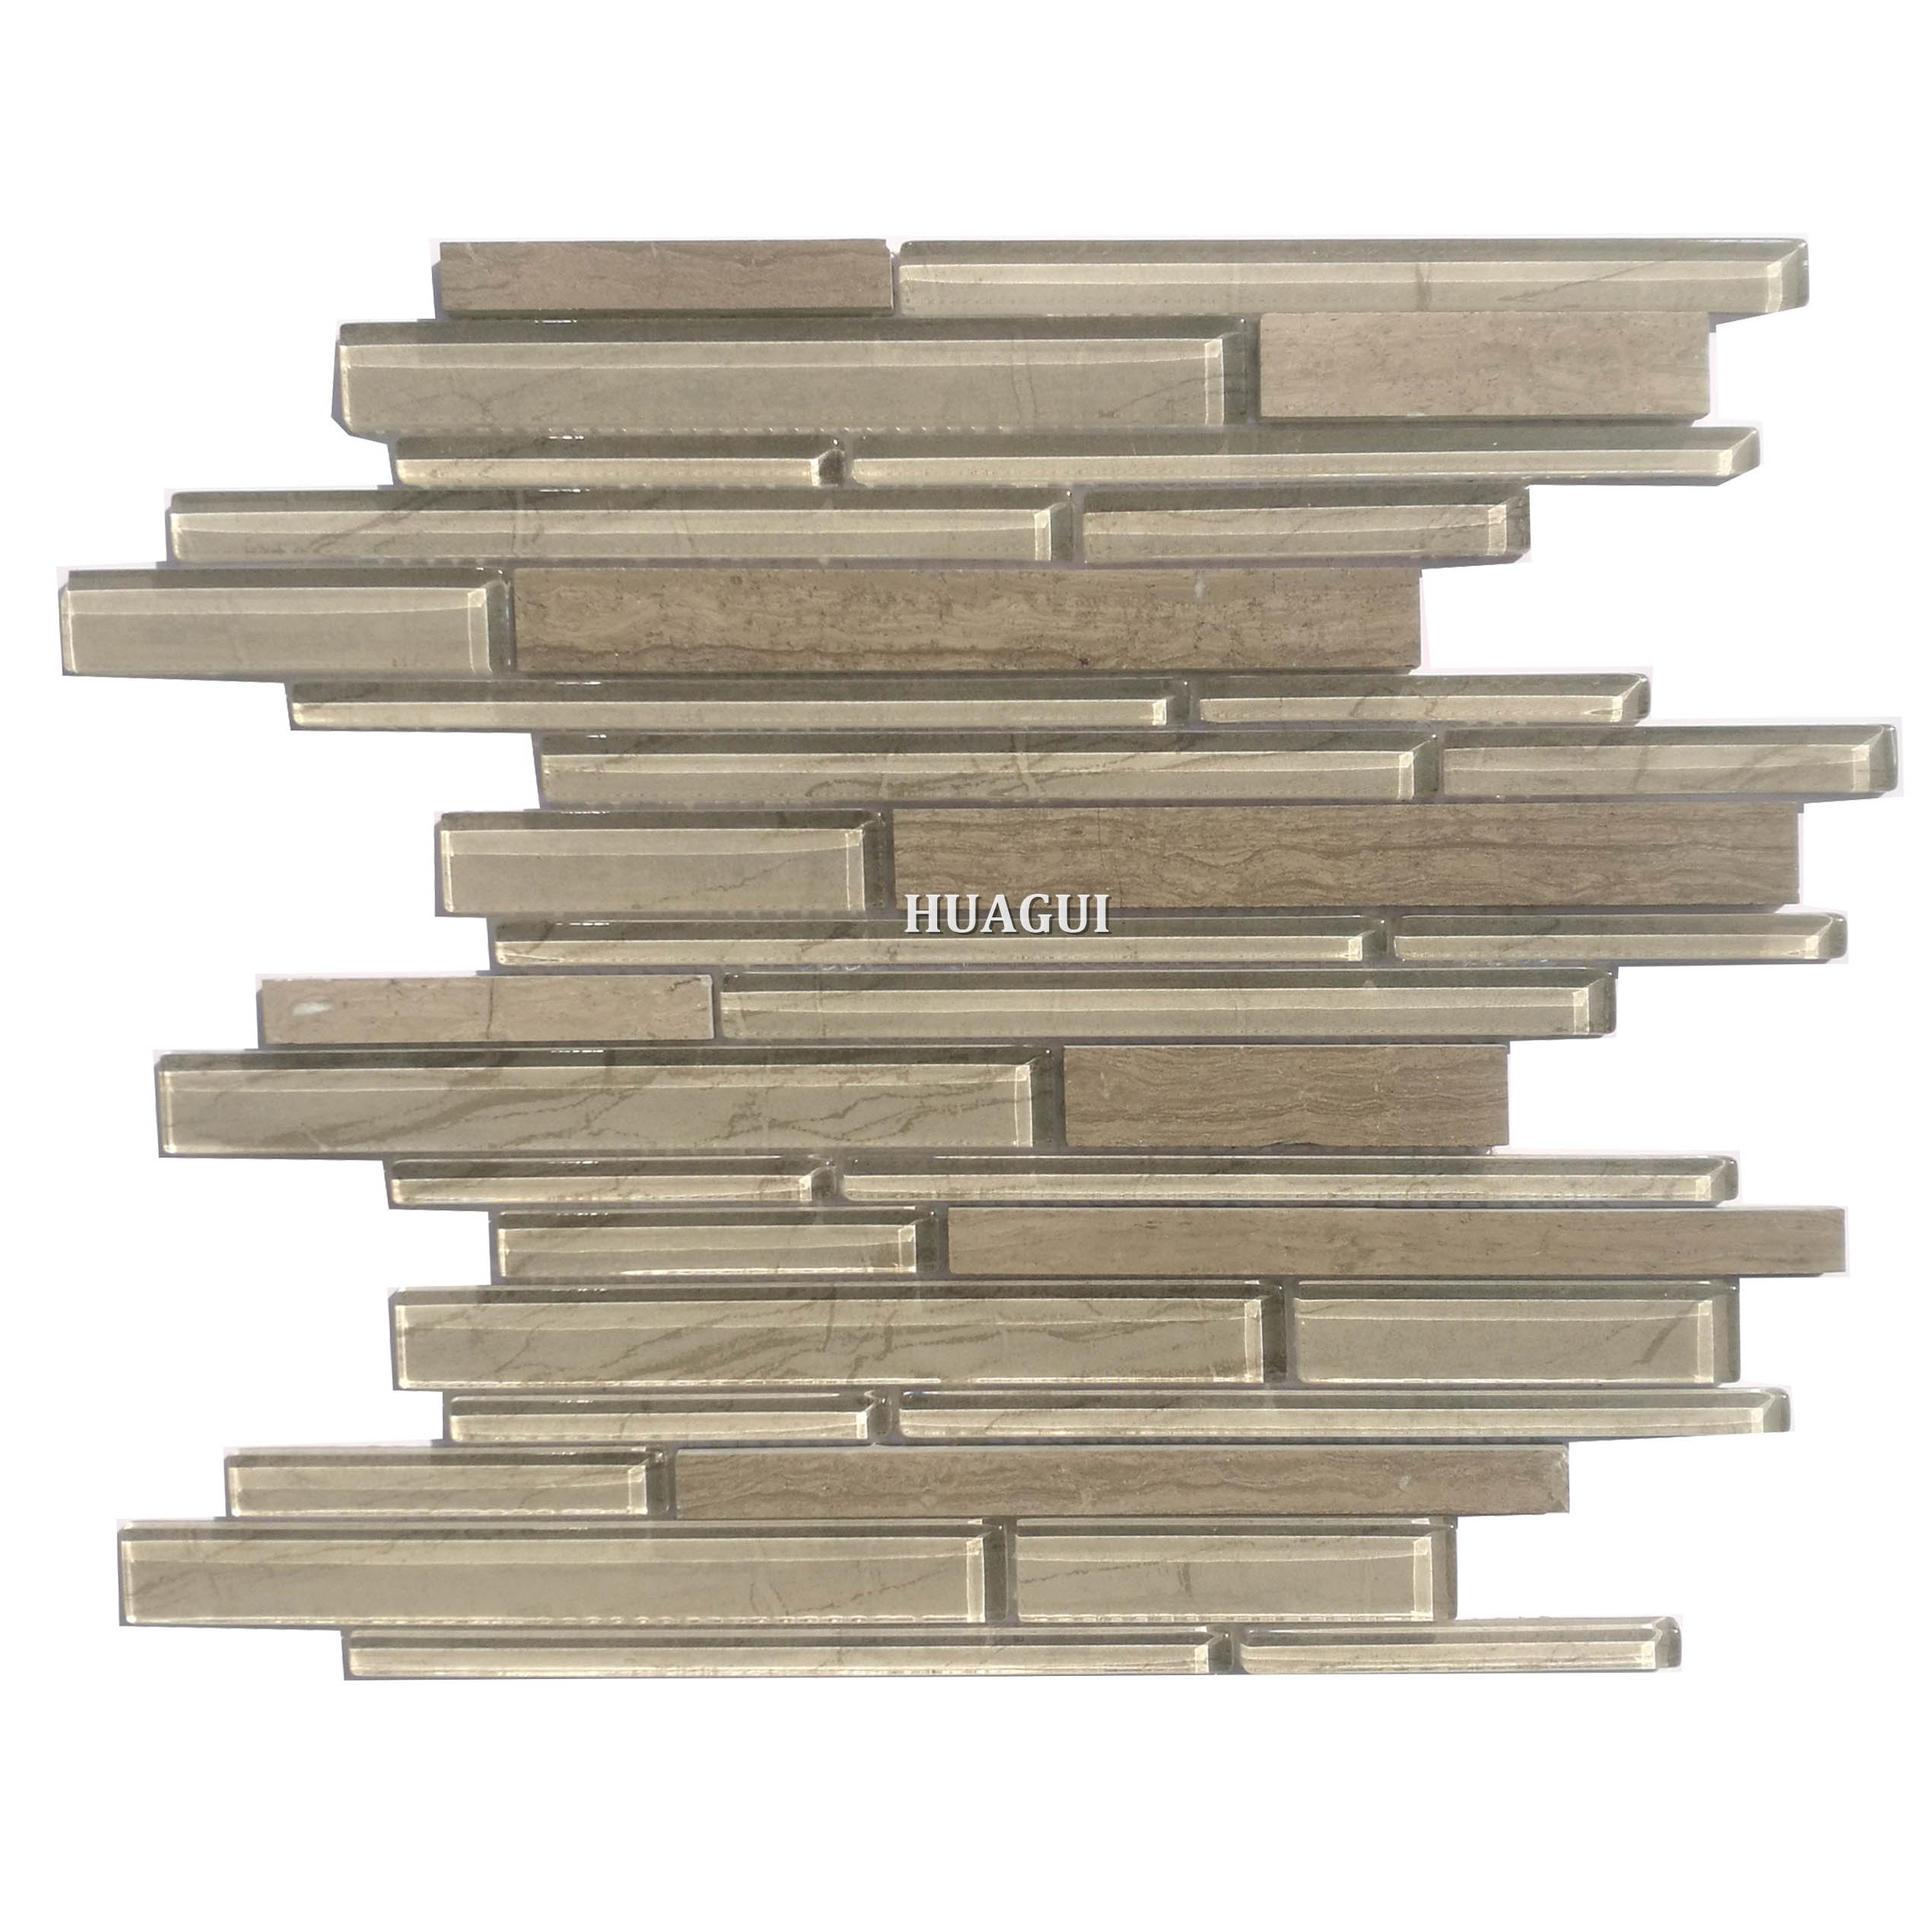 Linear stove backsplash ideas glossy strip glass mix stone wall tile for sale